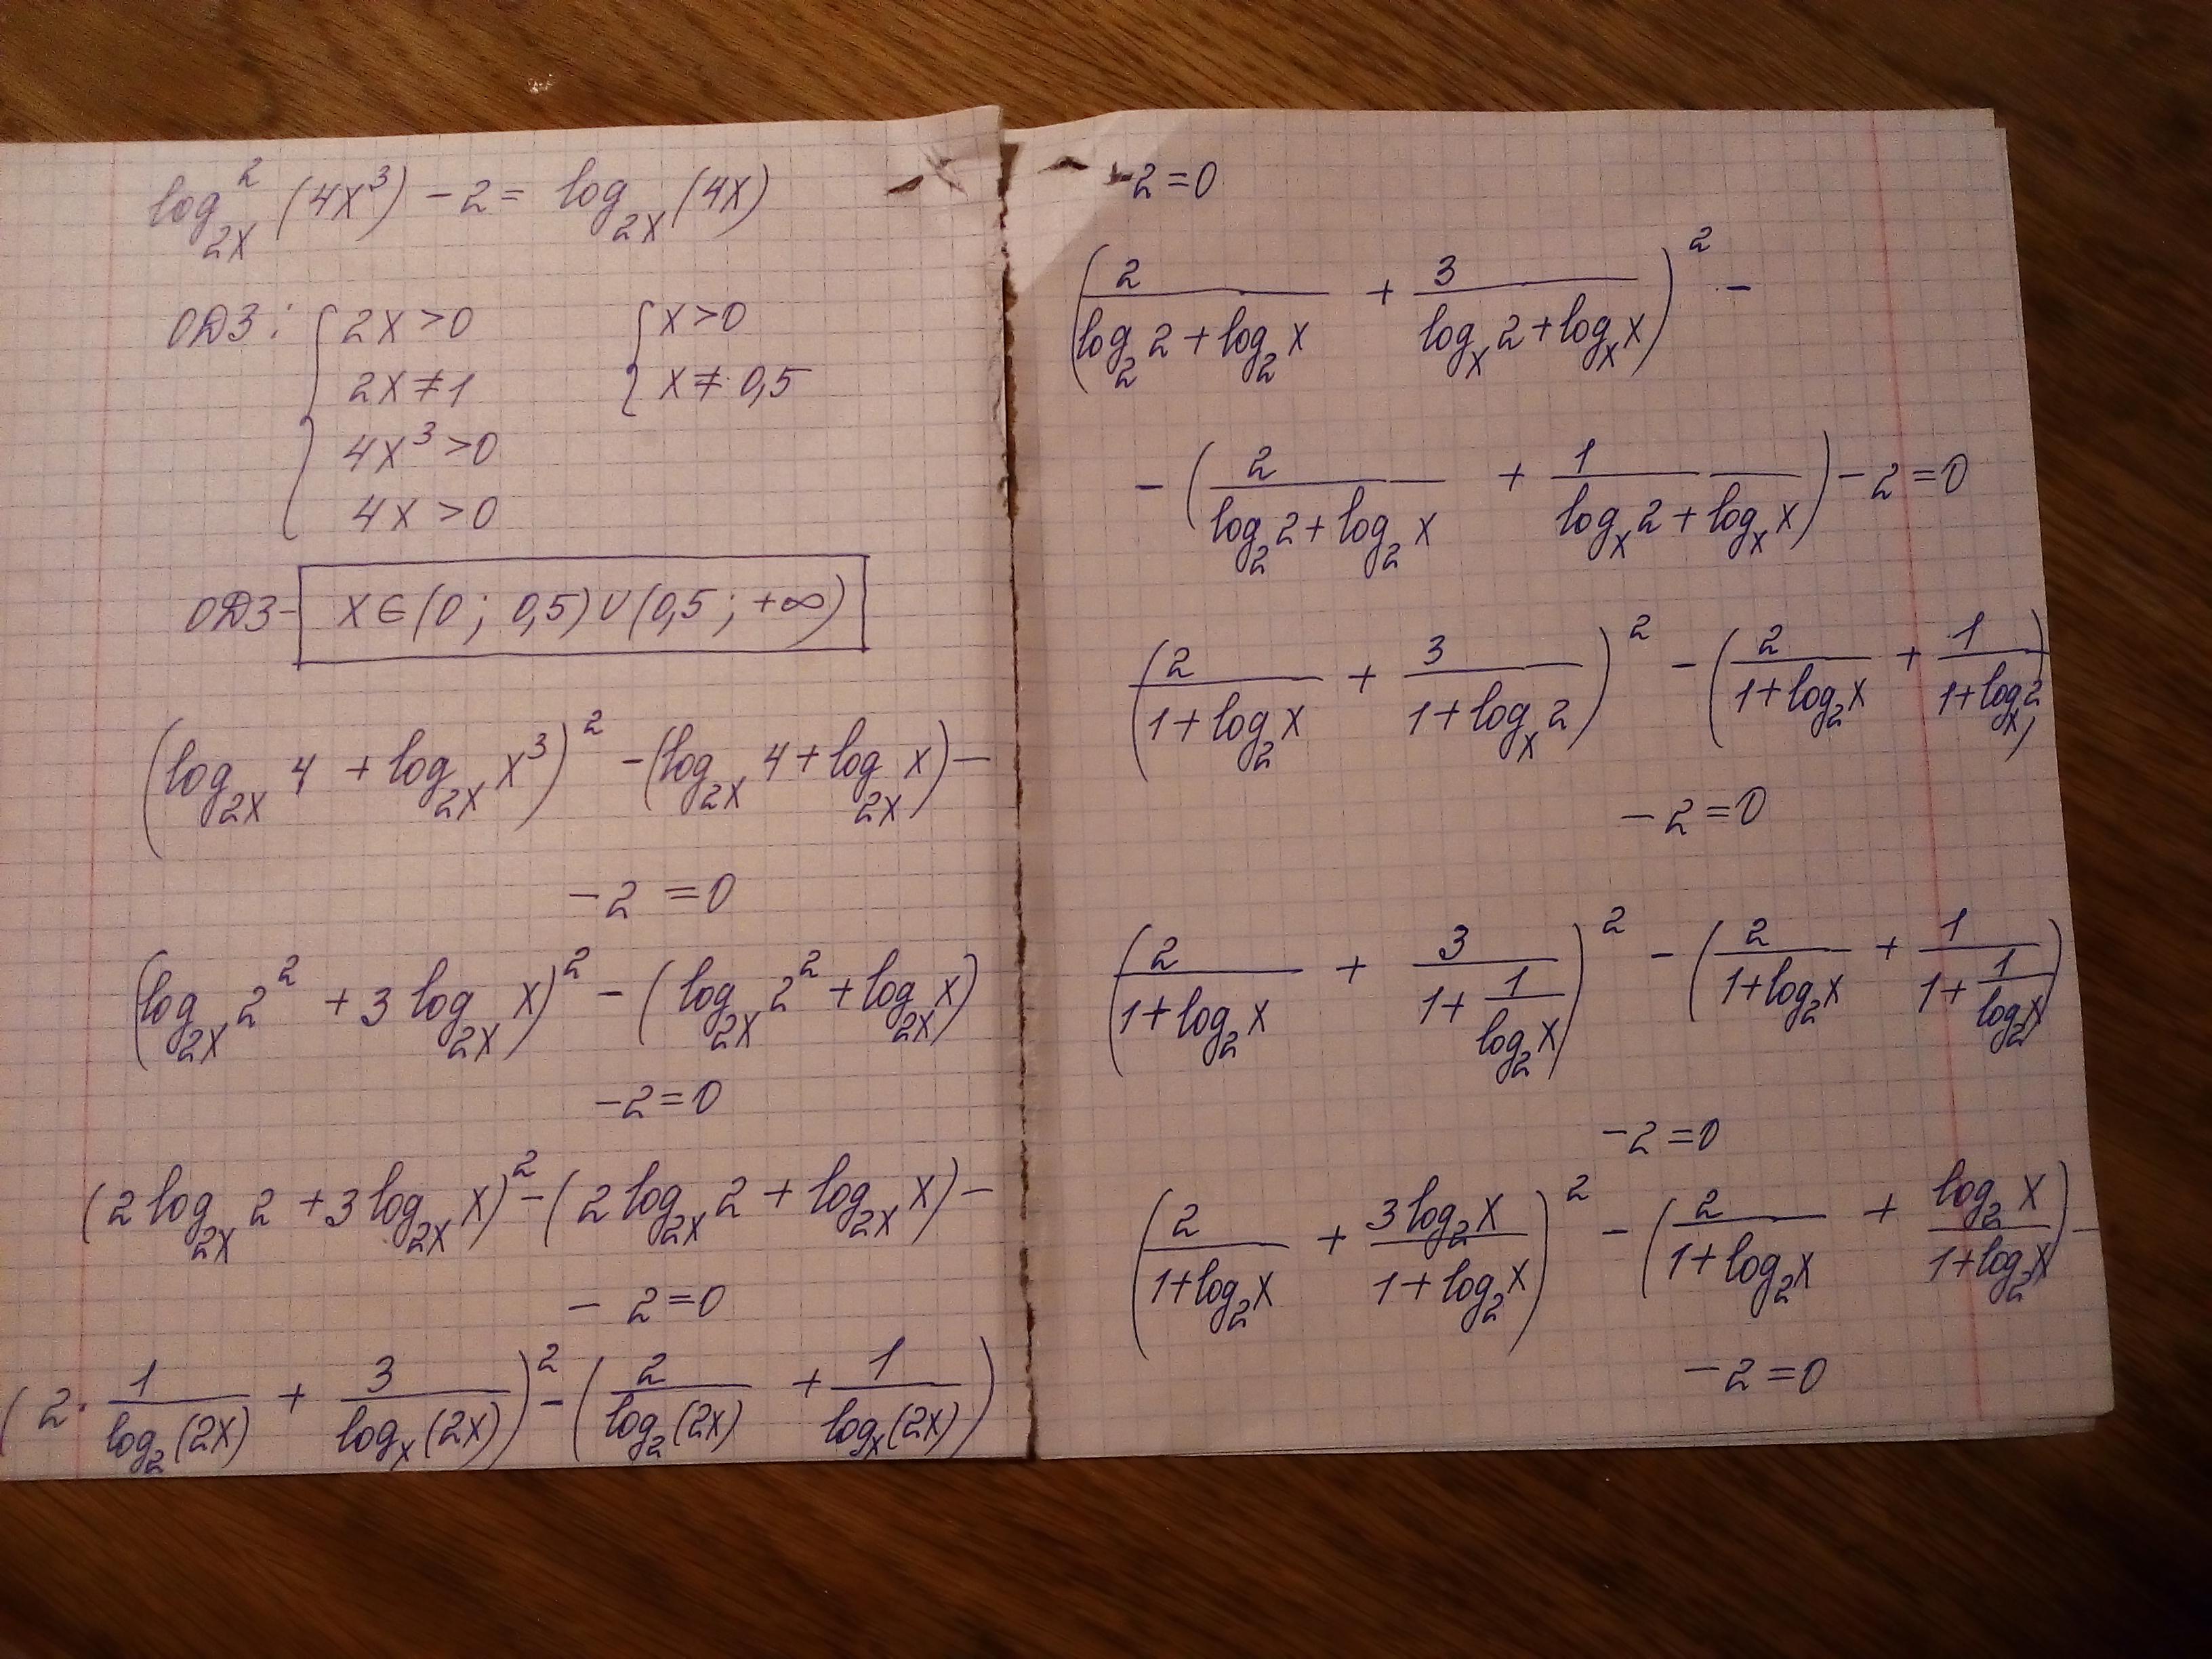 (log2x(4x^3))^2 -2=log2x(4x)